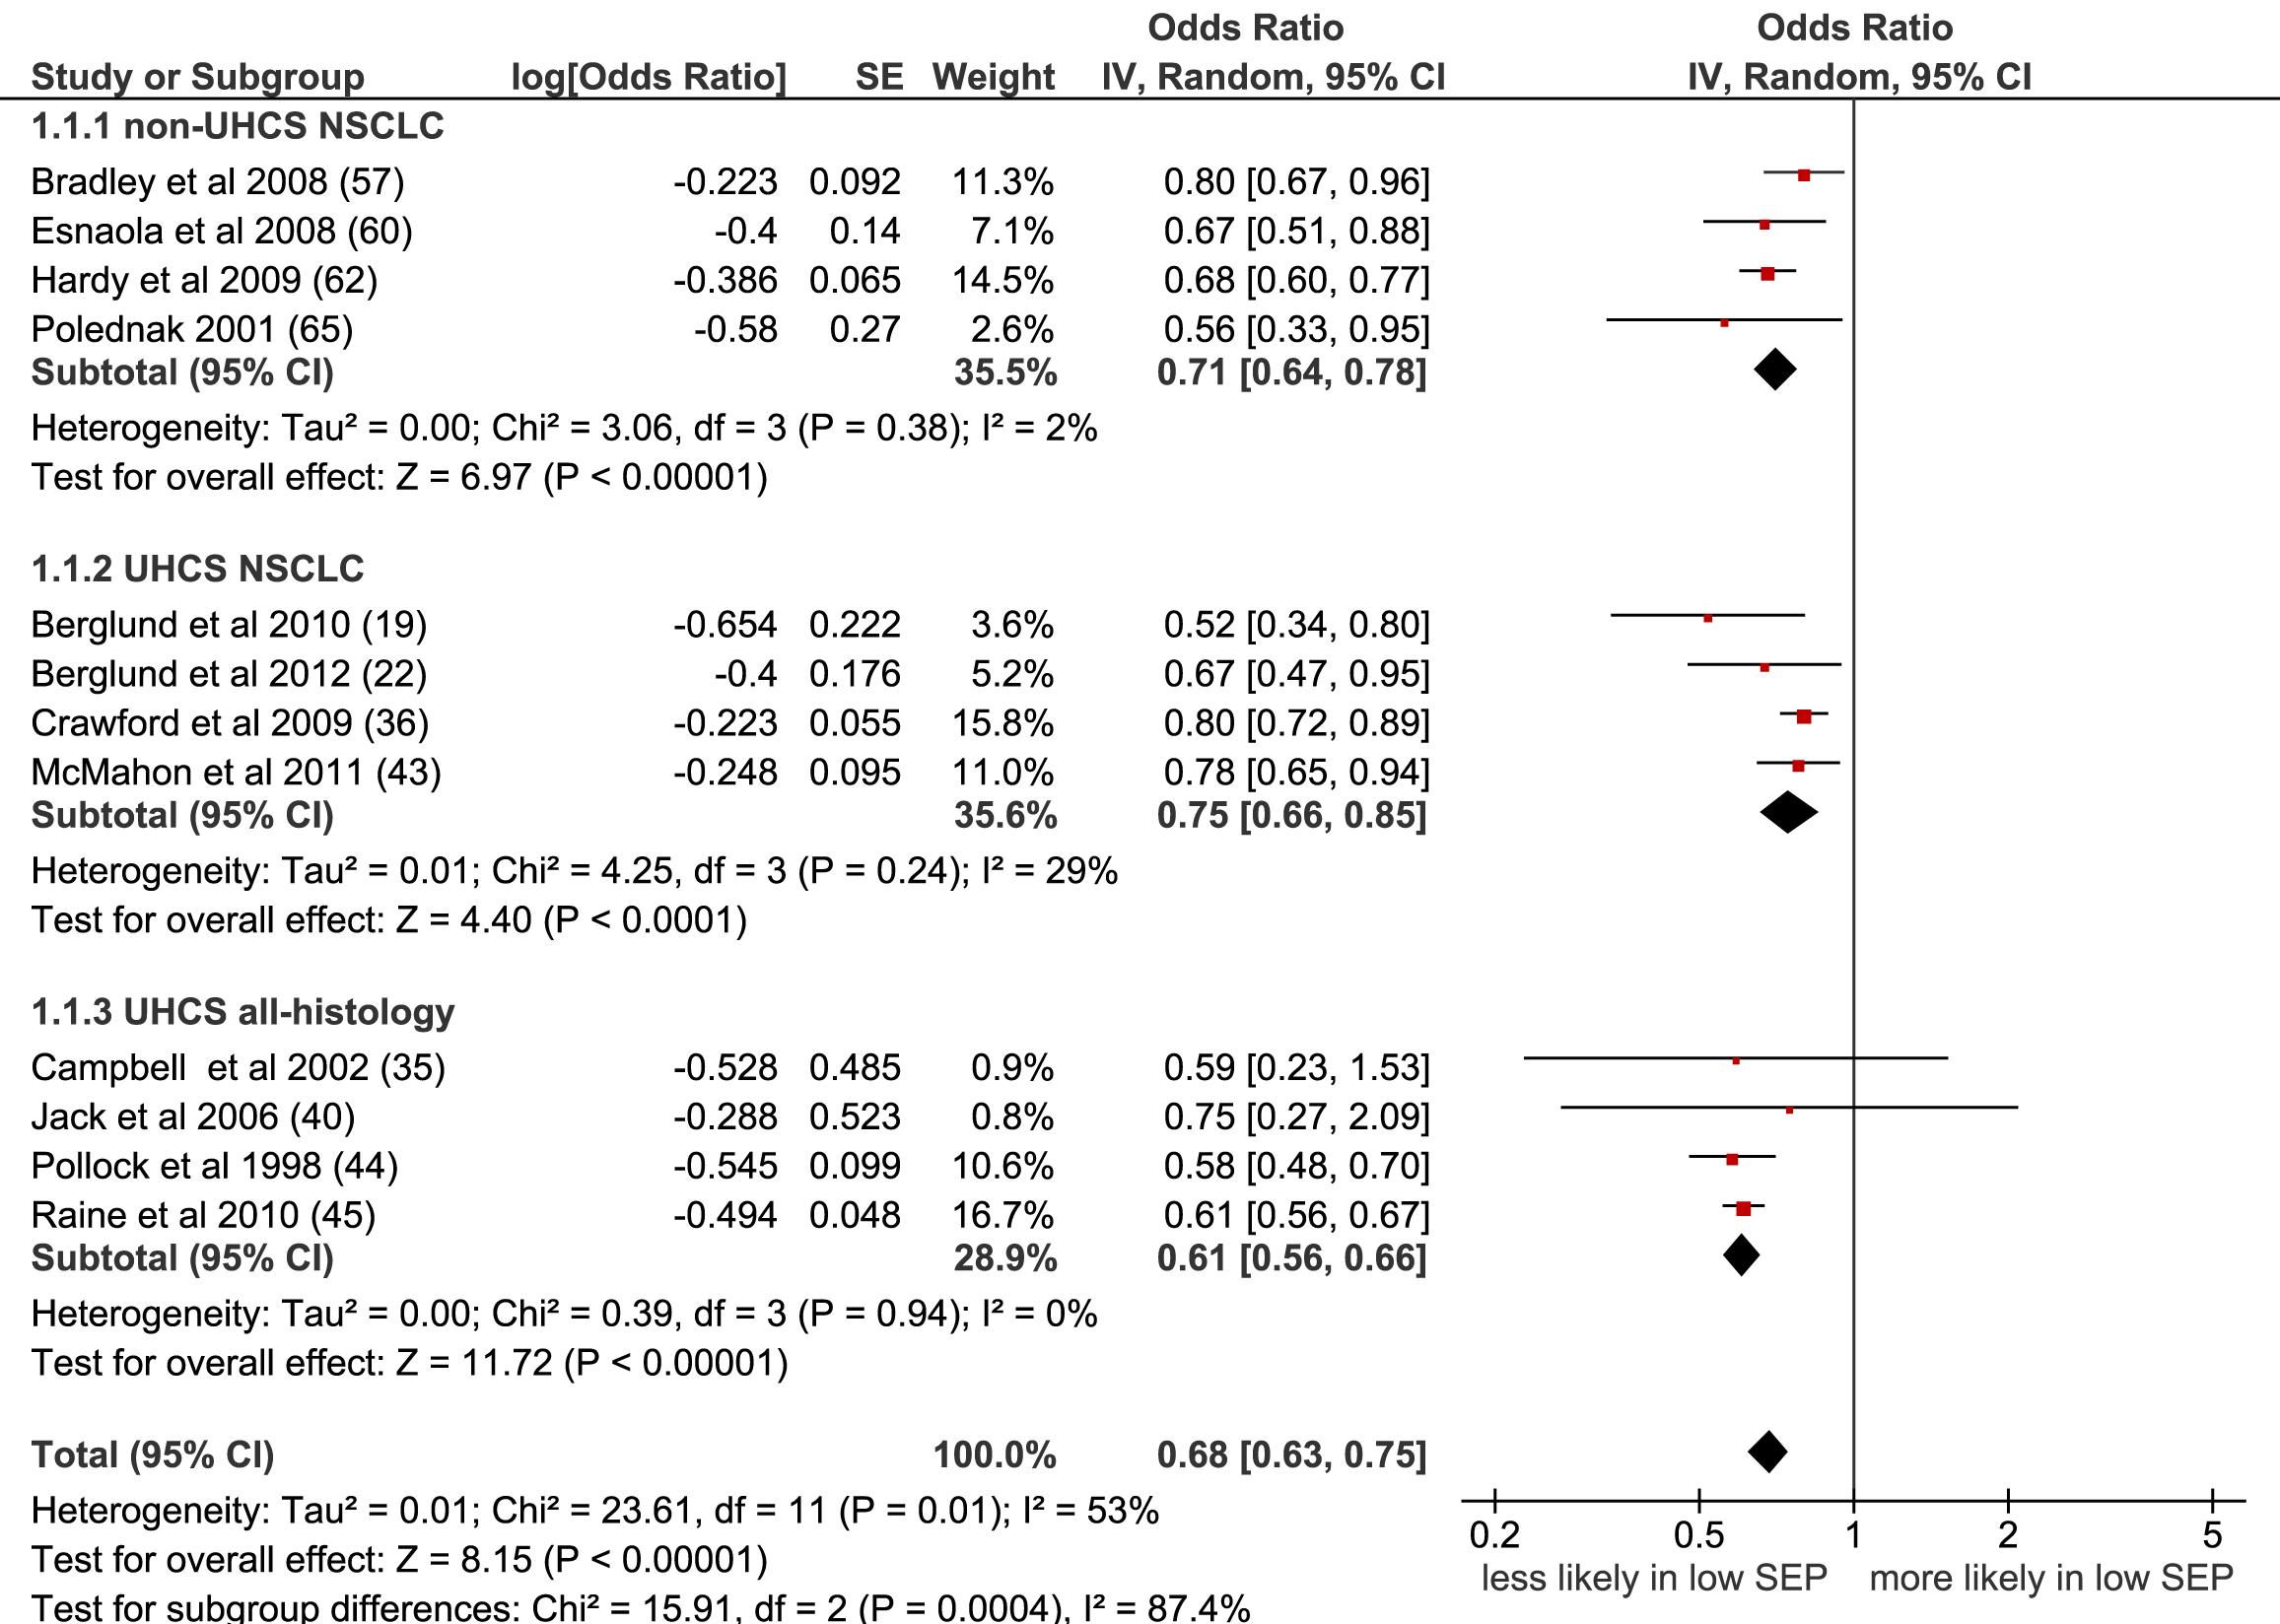 Meta-analysis of odds of receipt of surgery in low versus high SEP.